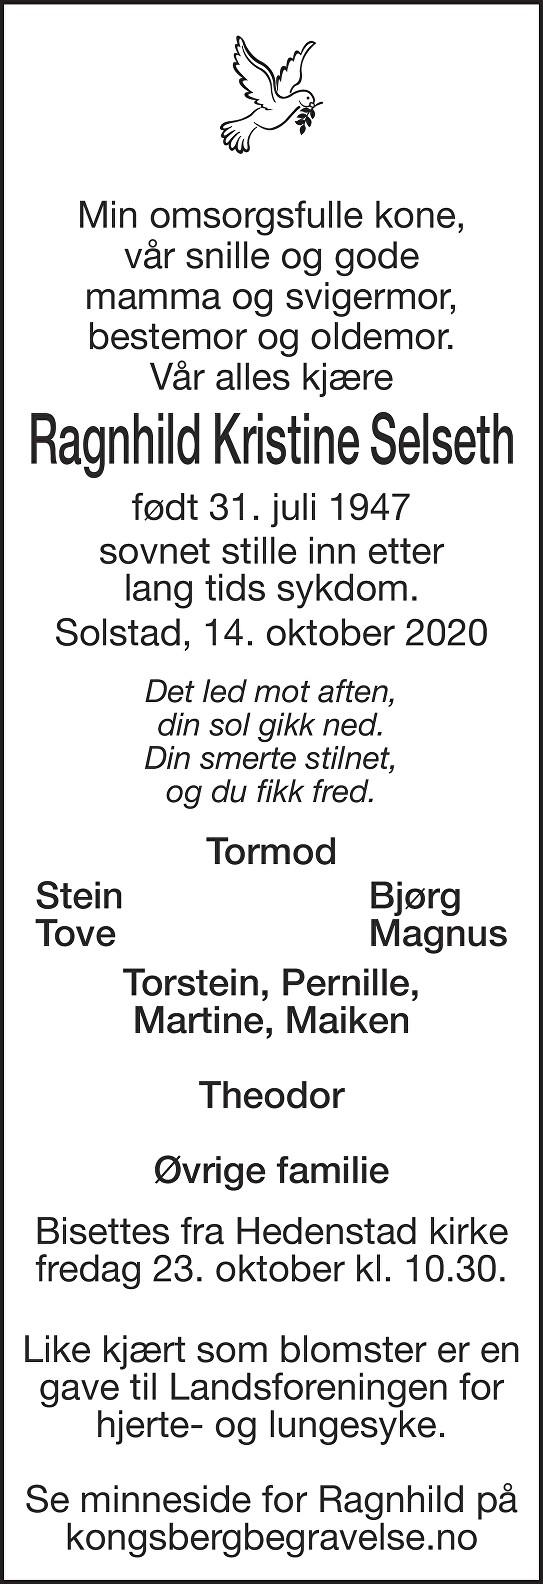 Ragnhild Kristine Selseth Dødsannonse